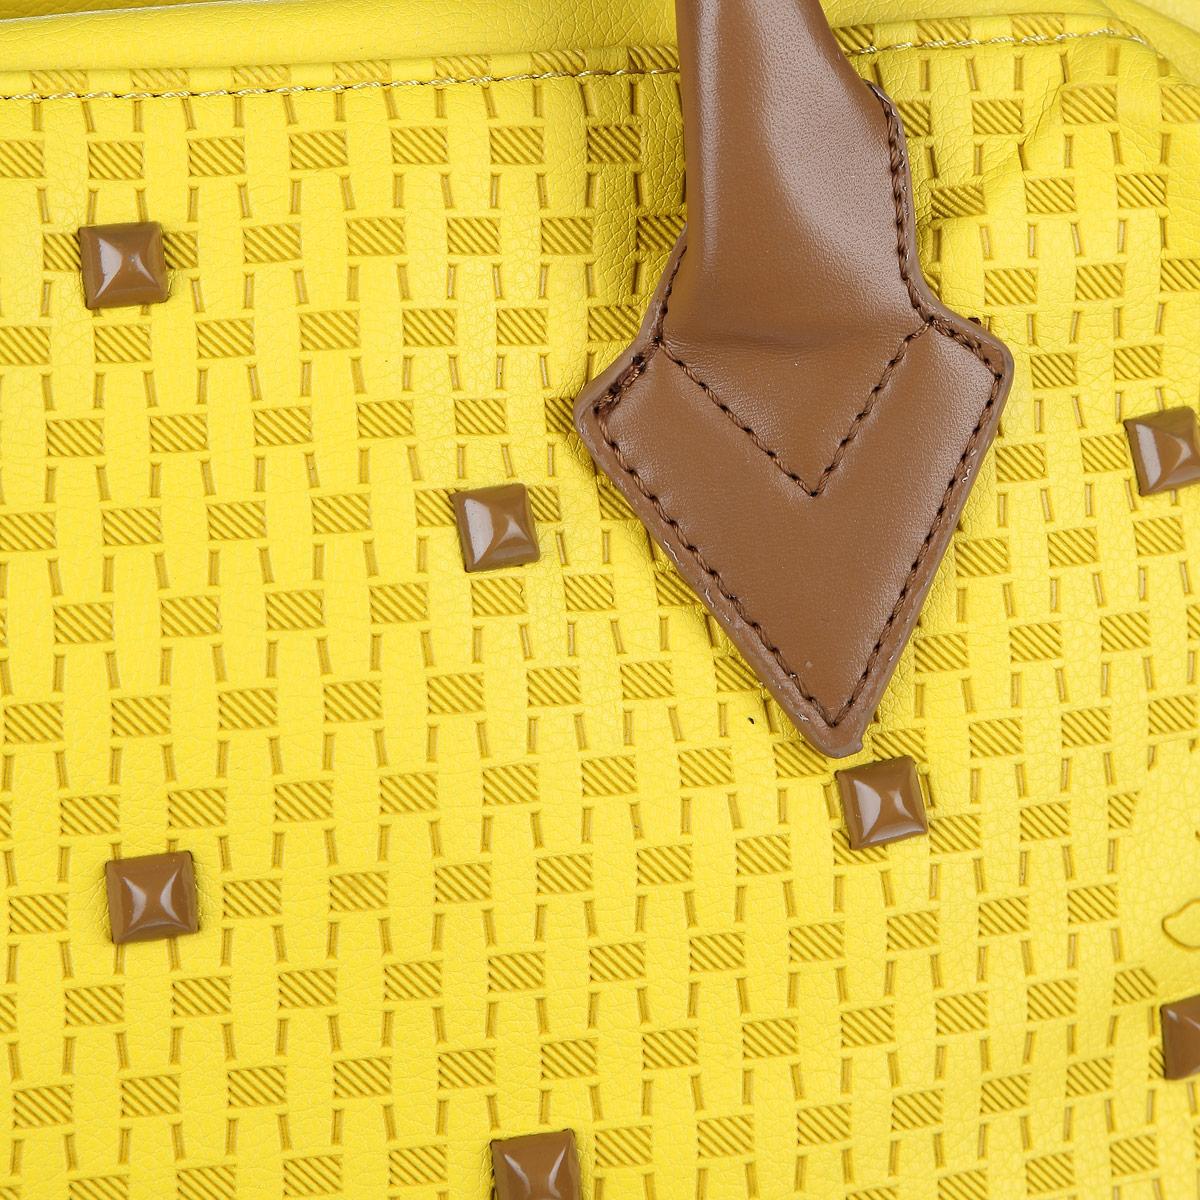 Сумка женская Orsa Oro, цвет: желтый, коричневый. D-801/49